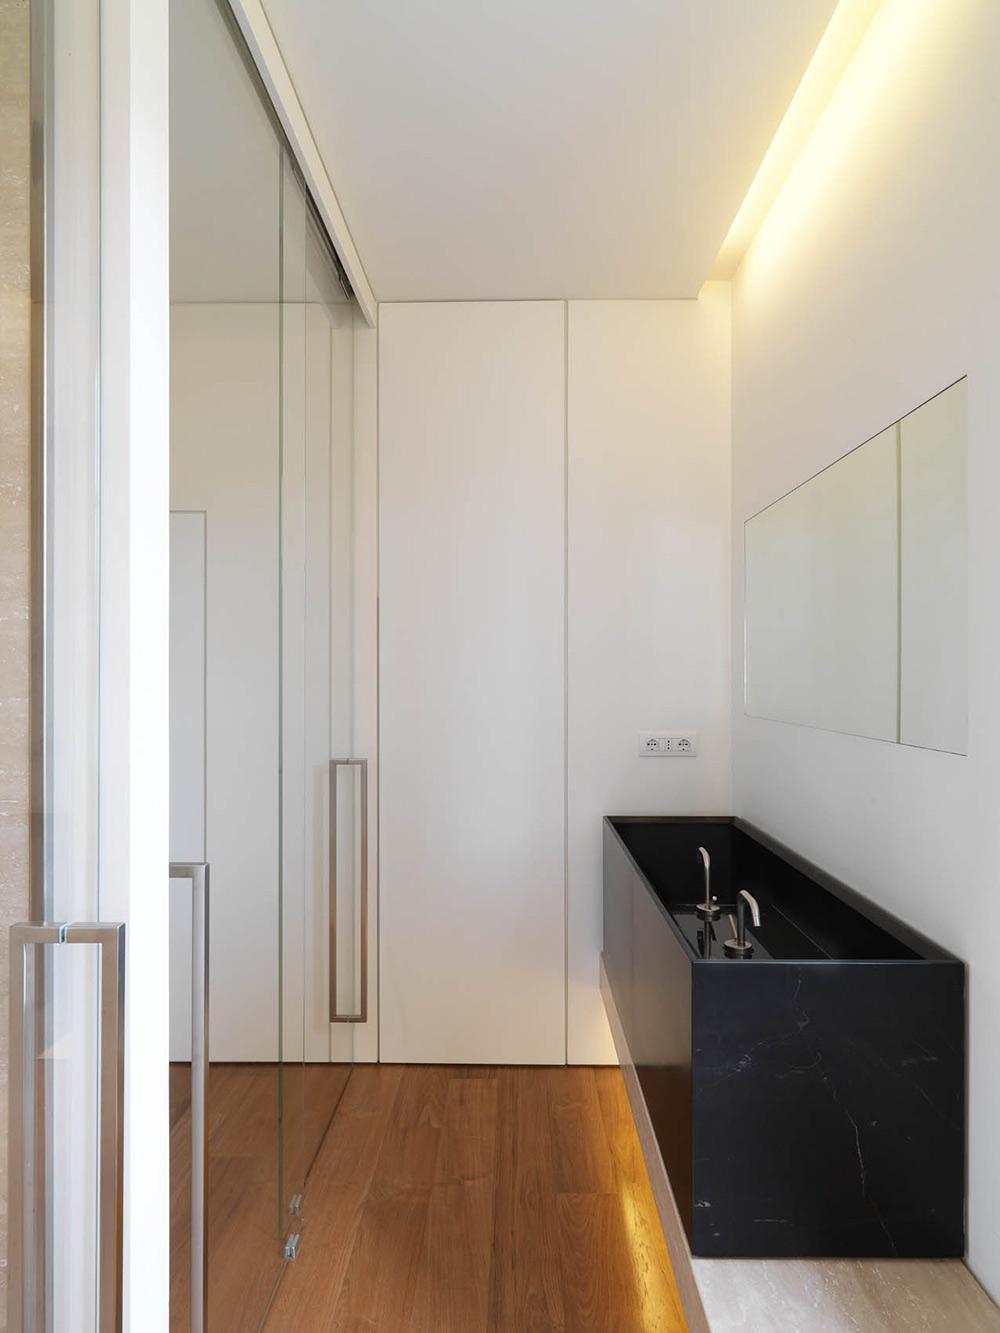 Bathroom, Dark Marble Sink, Minimalist Interior in Tuscany, Italy by Victor Vasilev